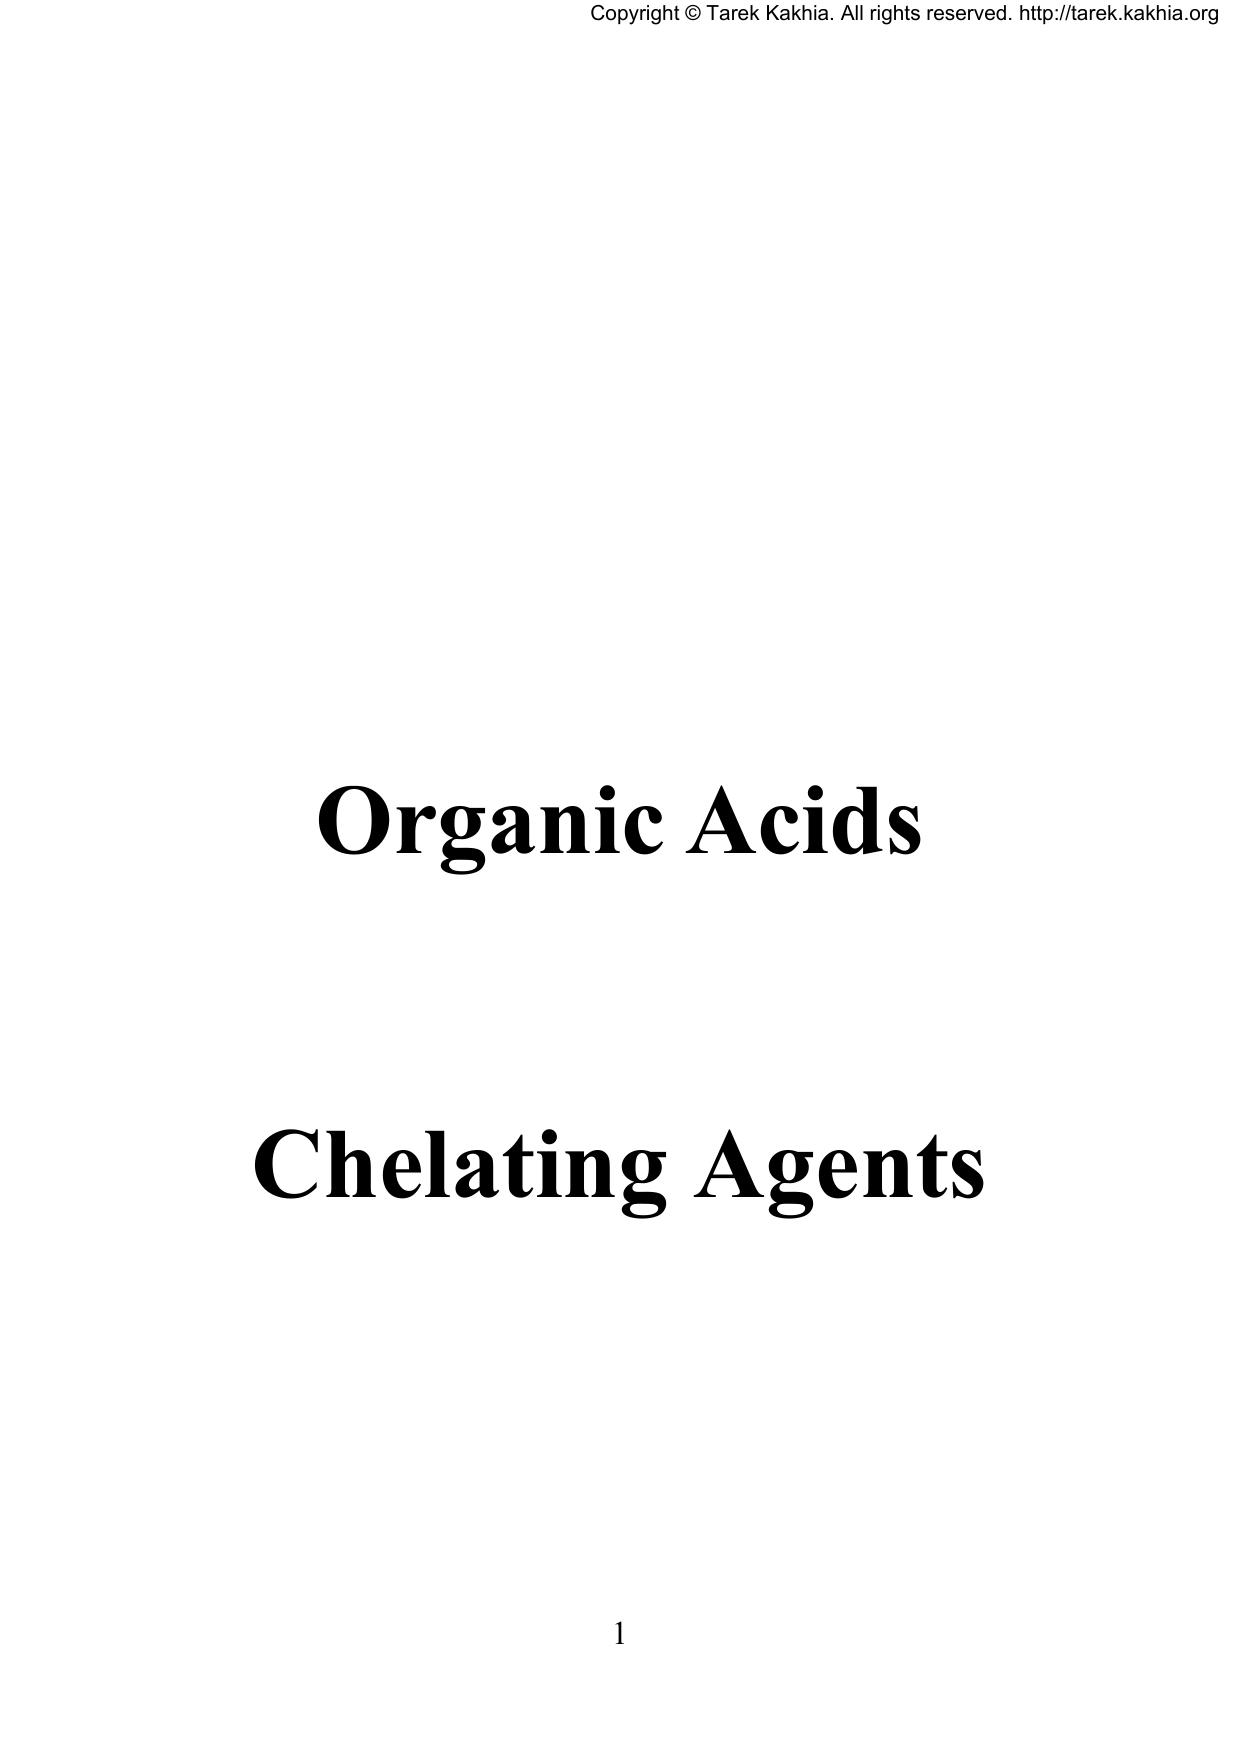 Organic Acids Chelating Agents